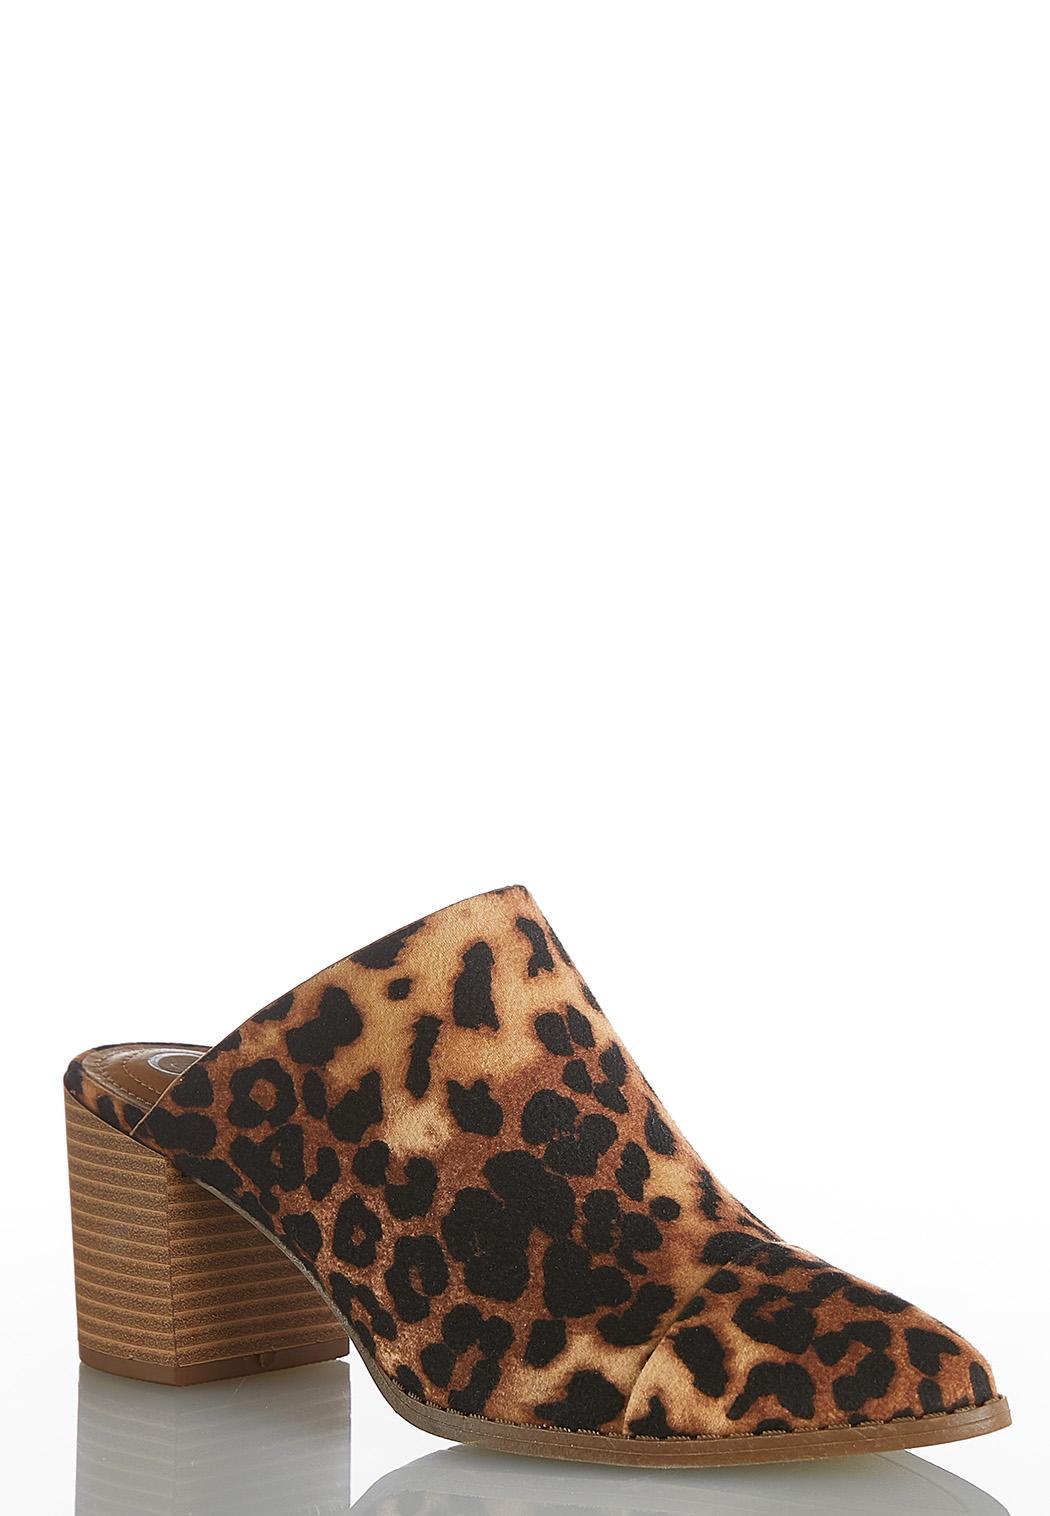 Leopard Block Heel Mules